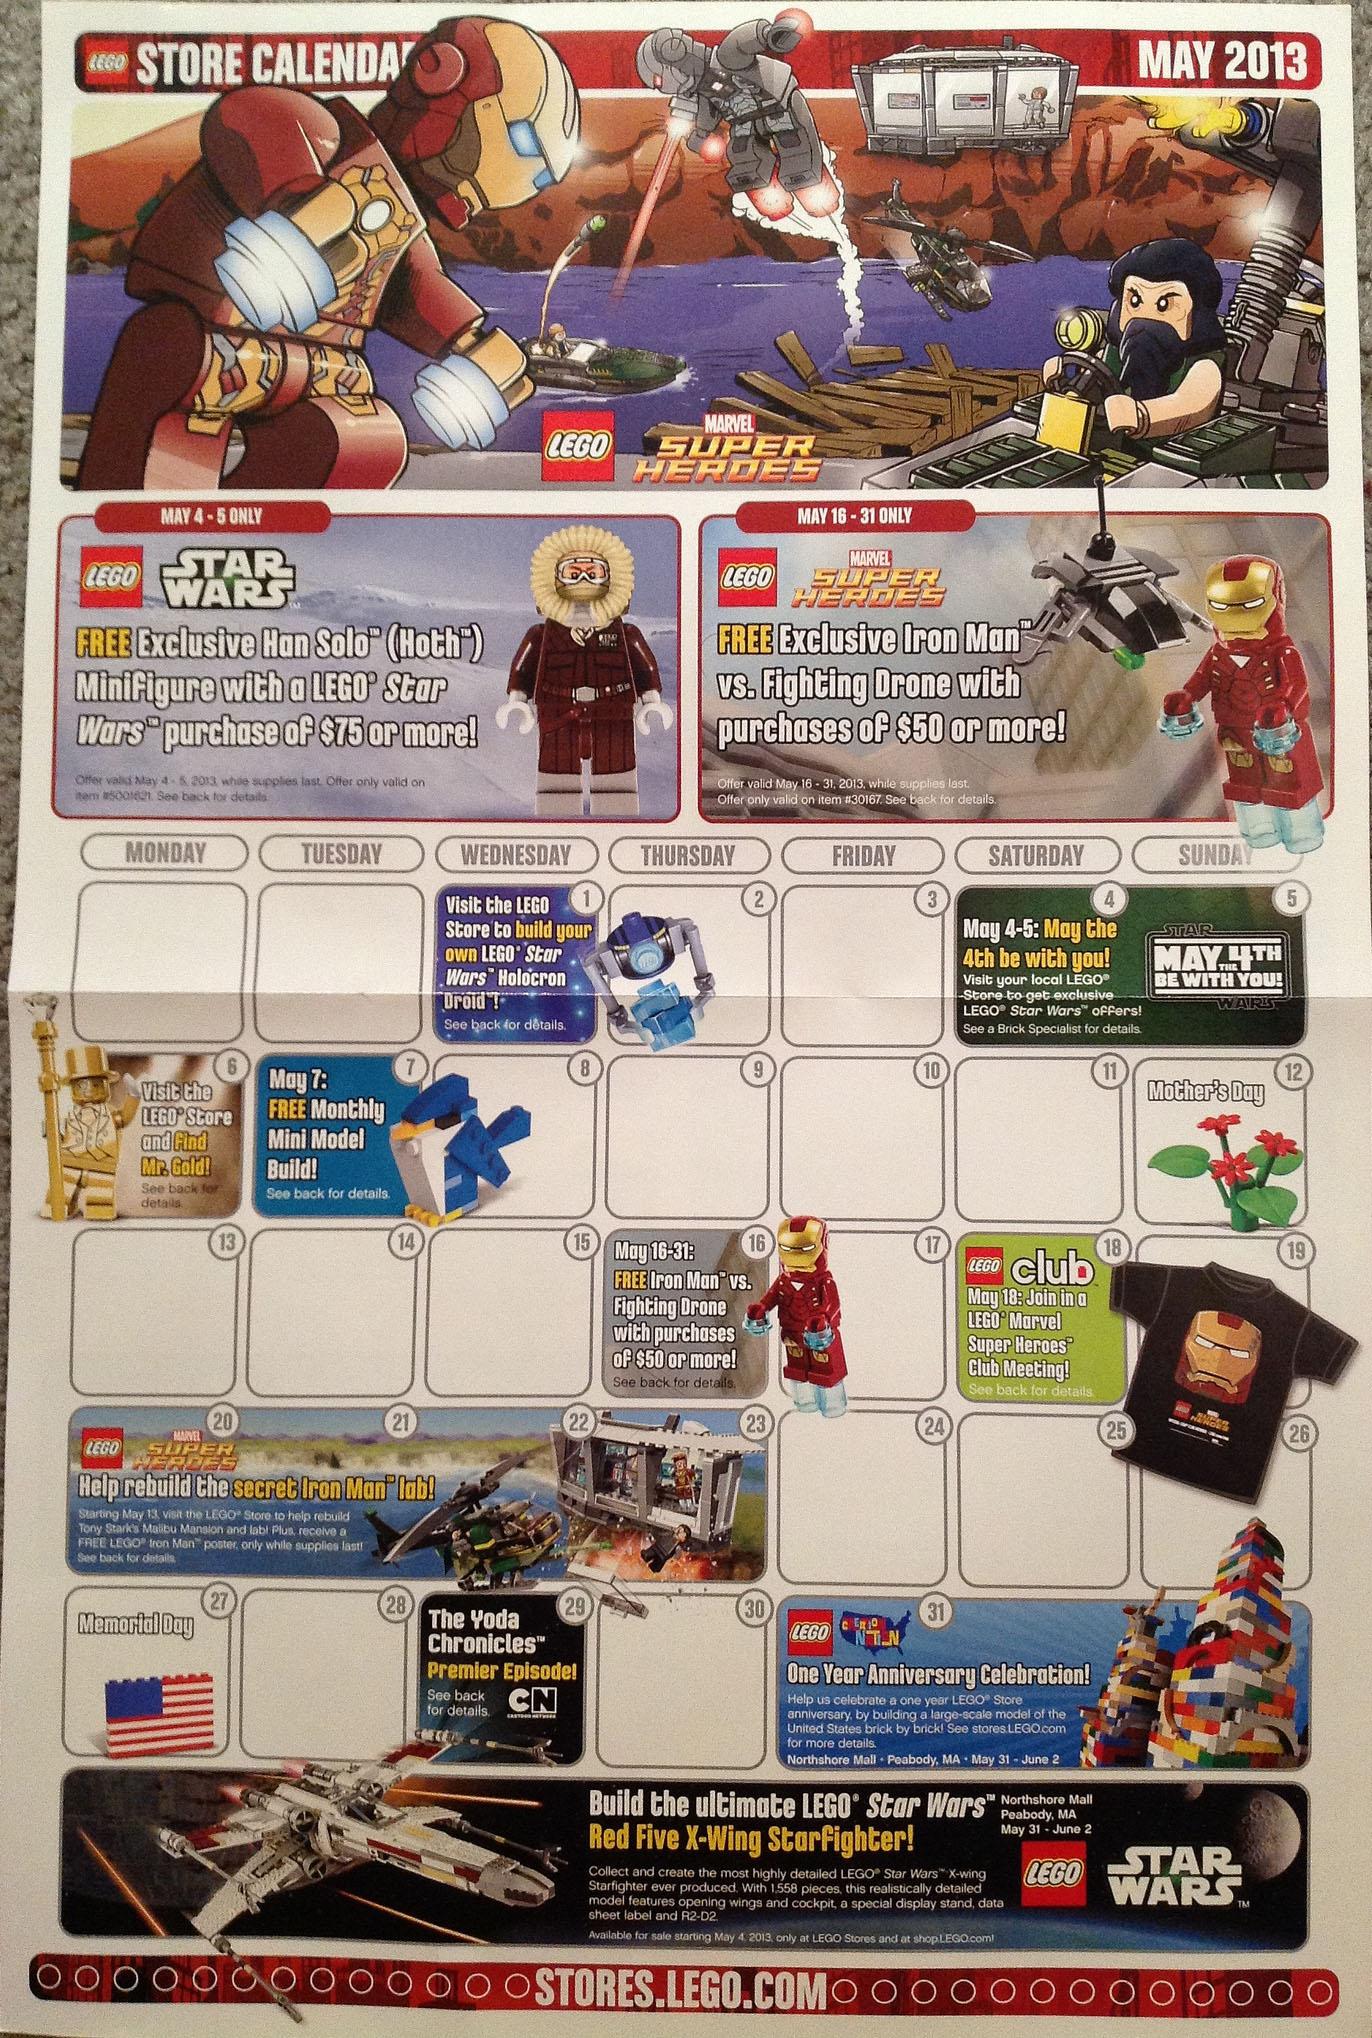 May 2013 Fashion Magazine Covers: May 2013 LEGO Store Calendar: Free Minifigure Promos